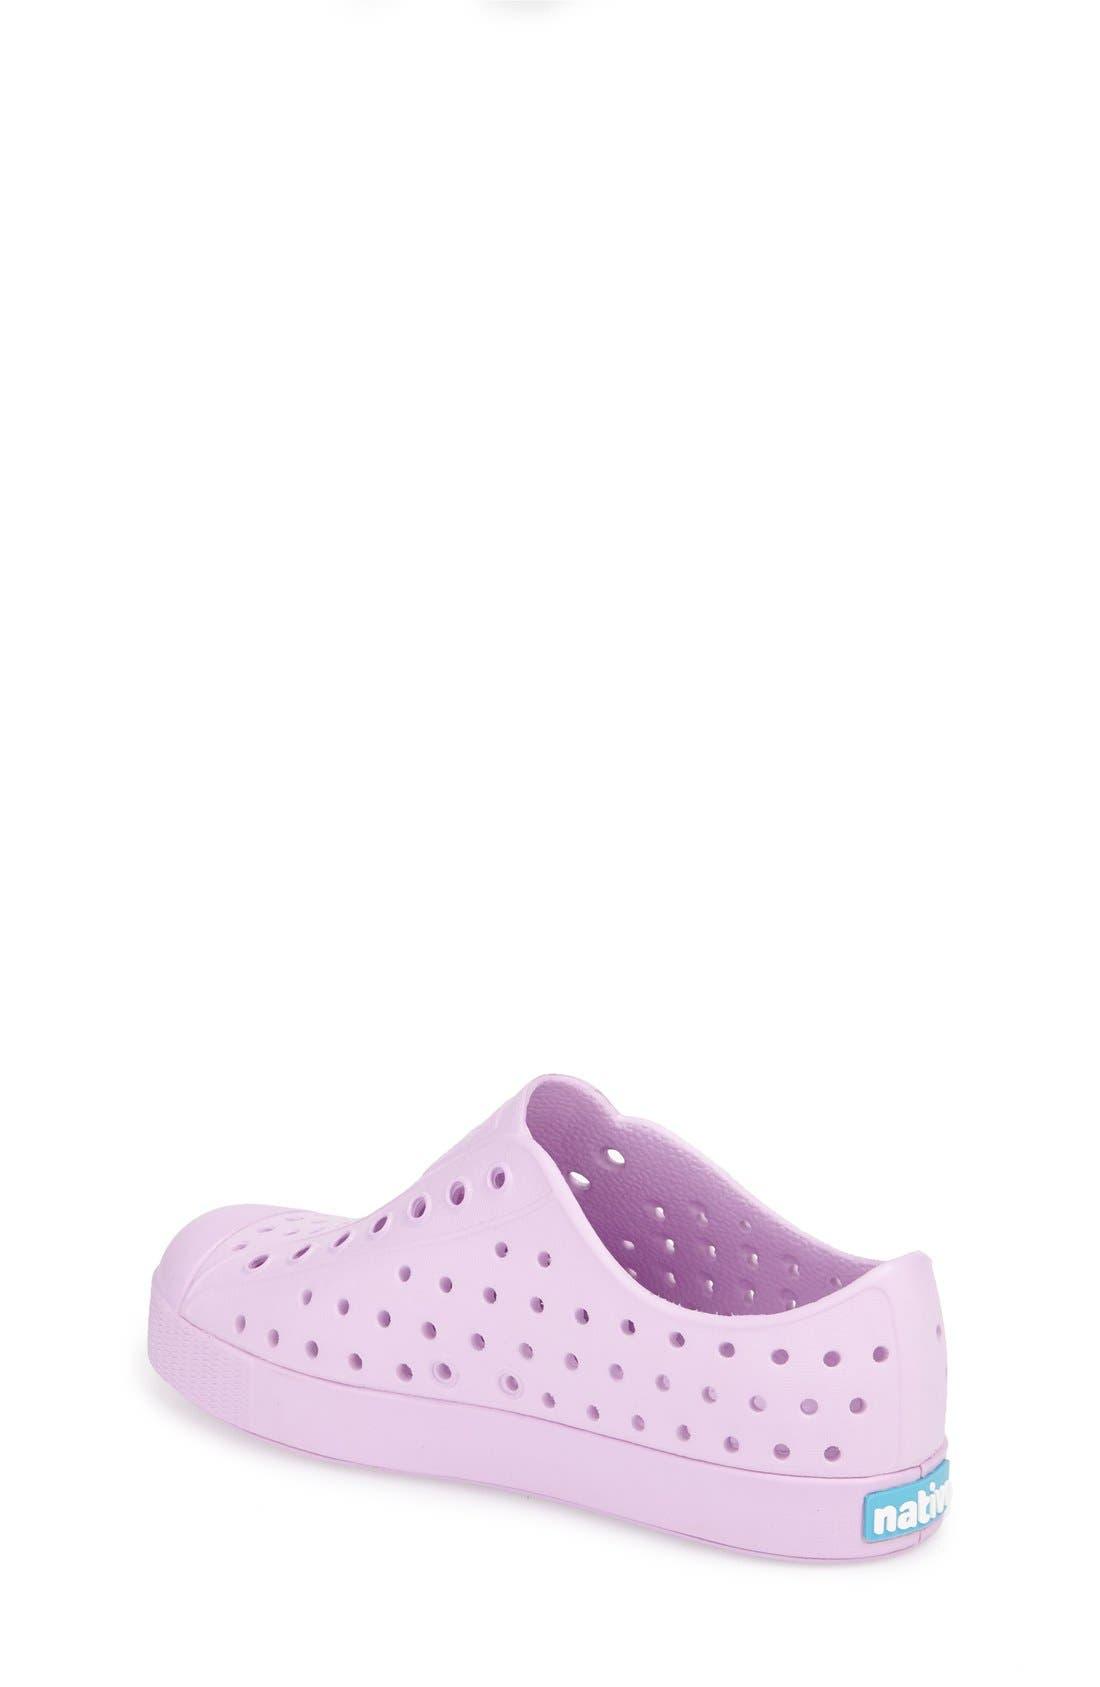 'Jefferson' Water Friendly Slip-On Sneaker,                             Alternate thumbnail 314, color,